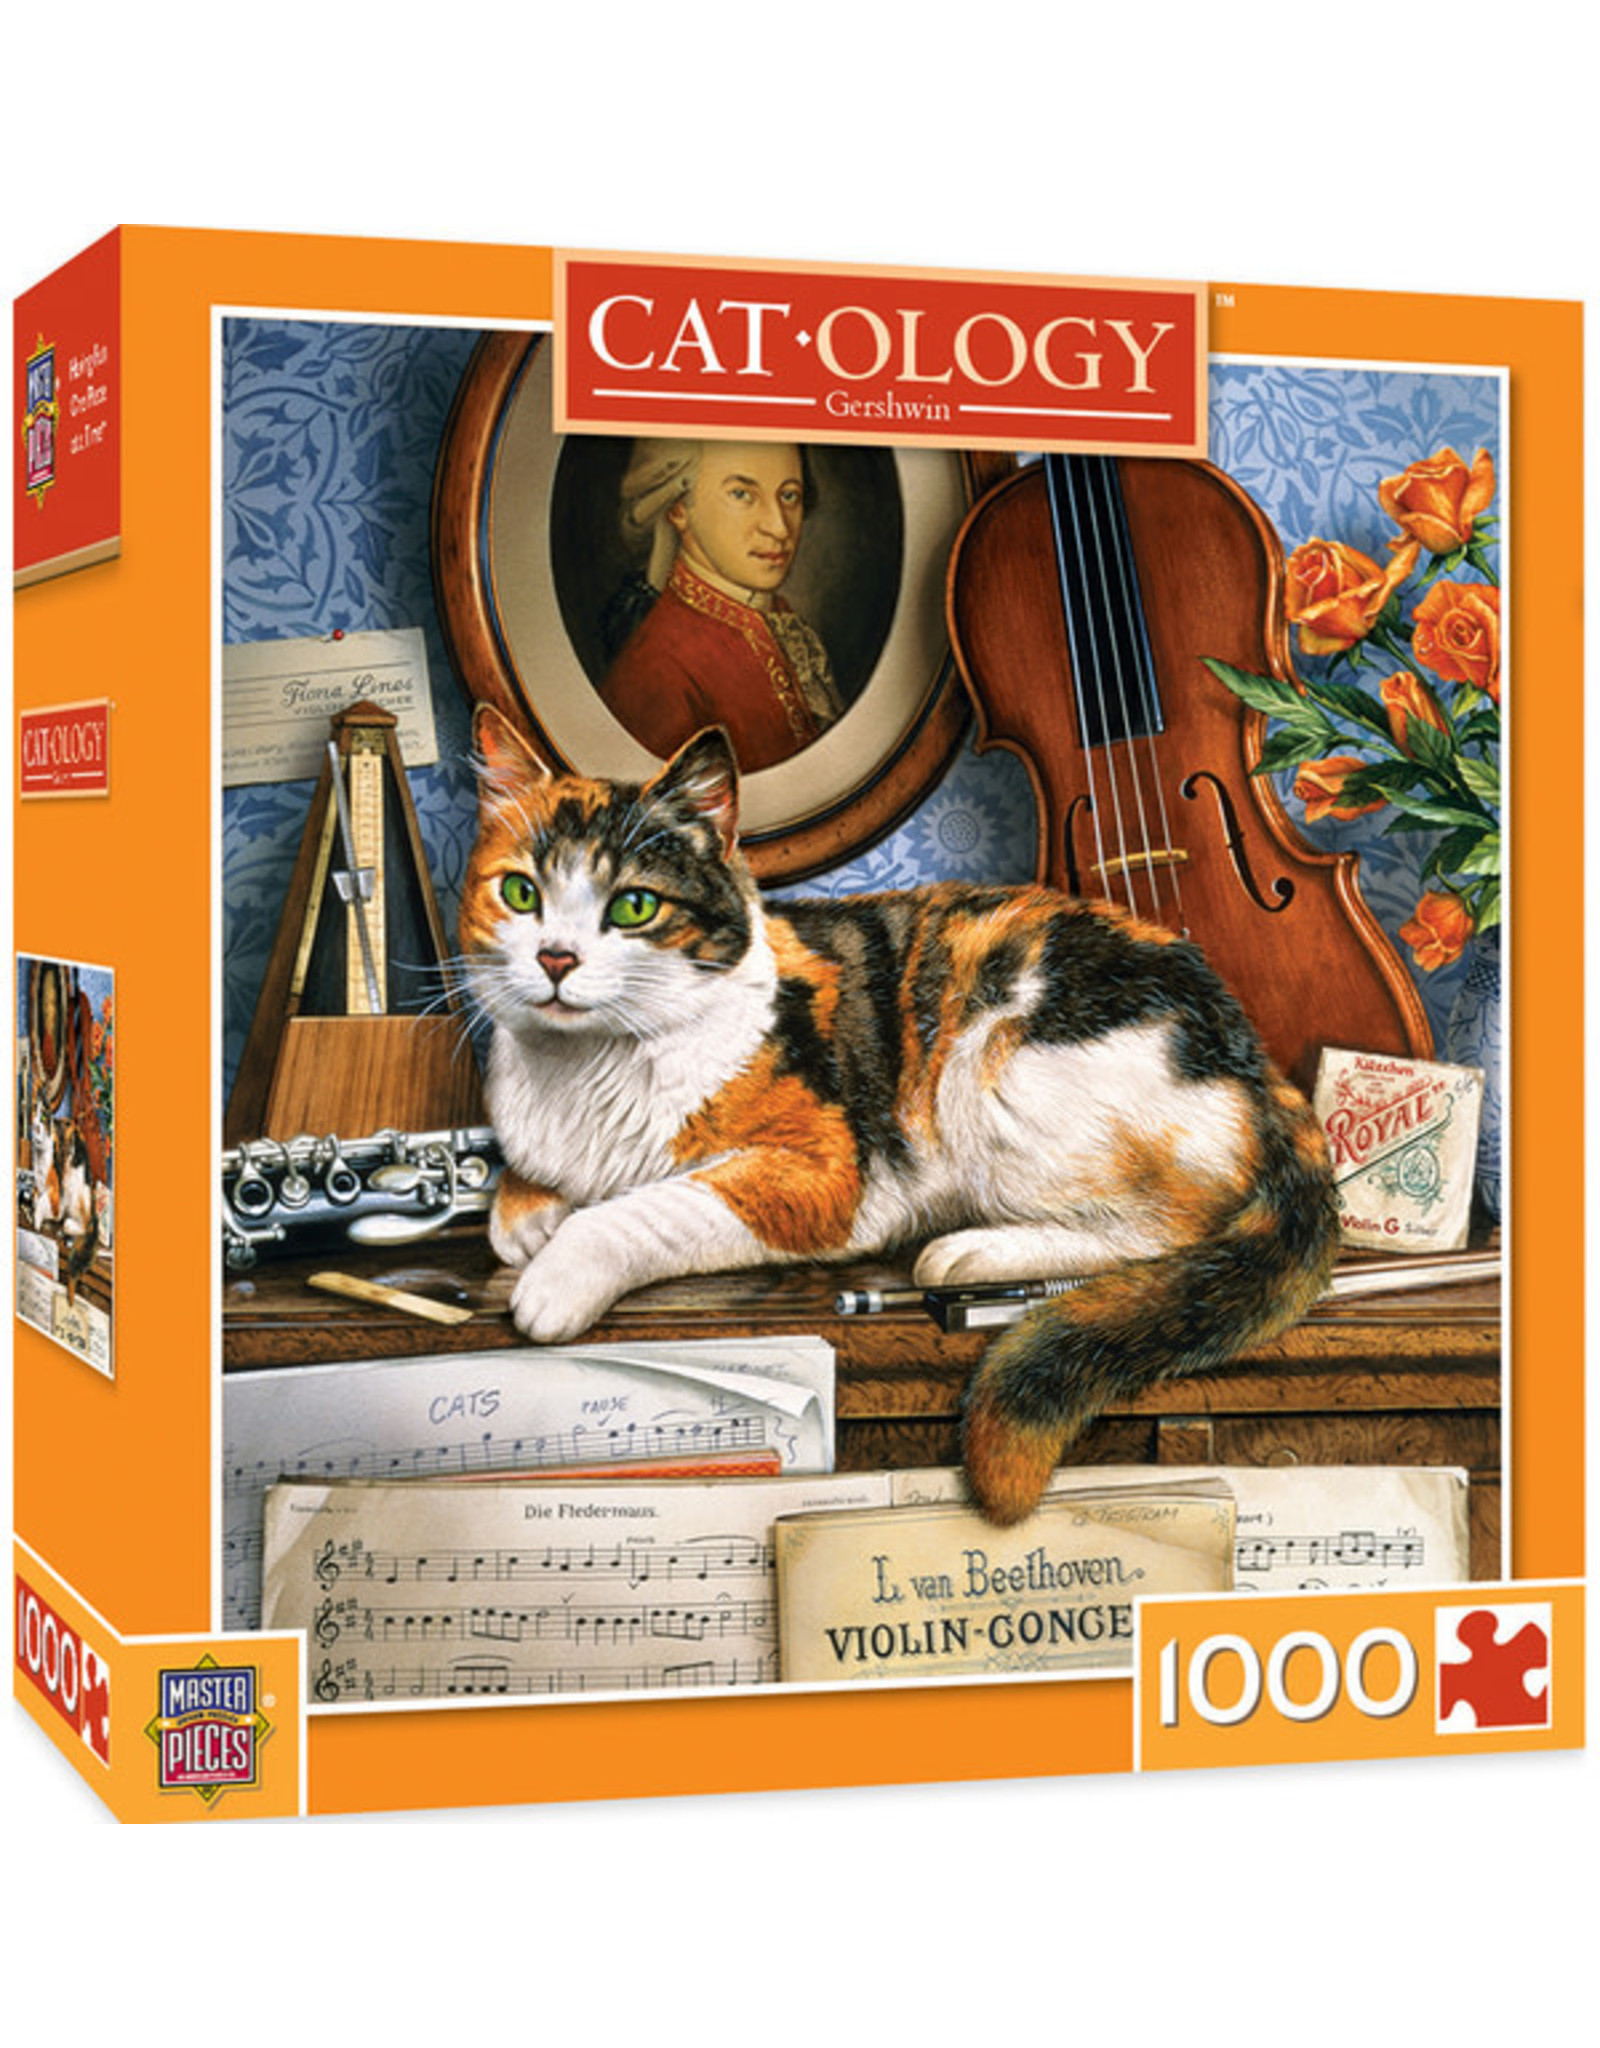 Masterpieces Puzzles Gerschwin 1000pc